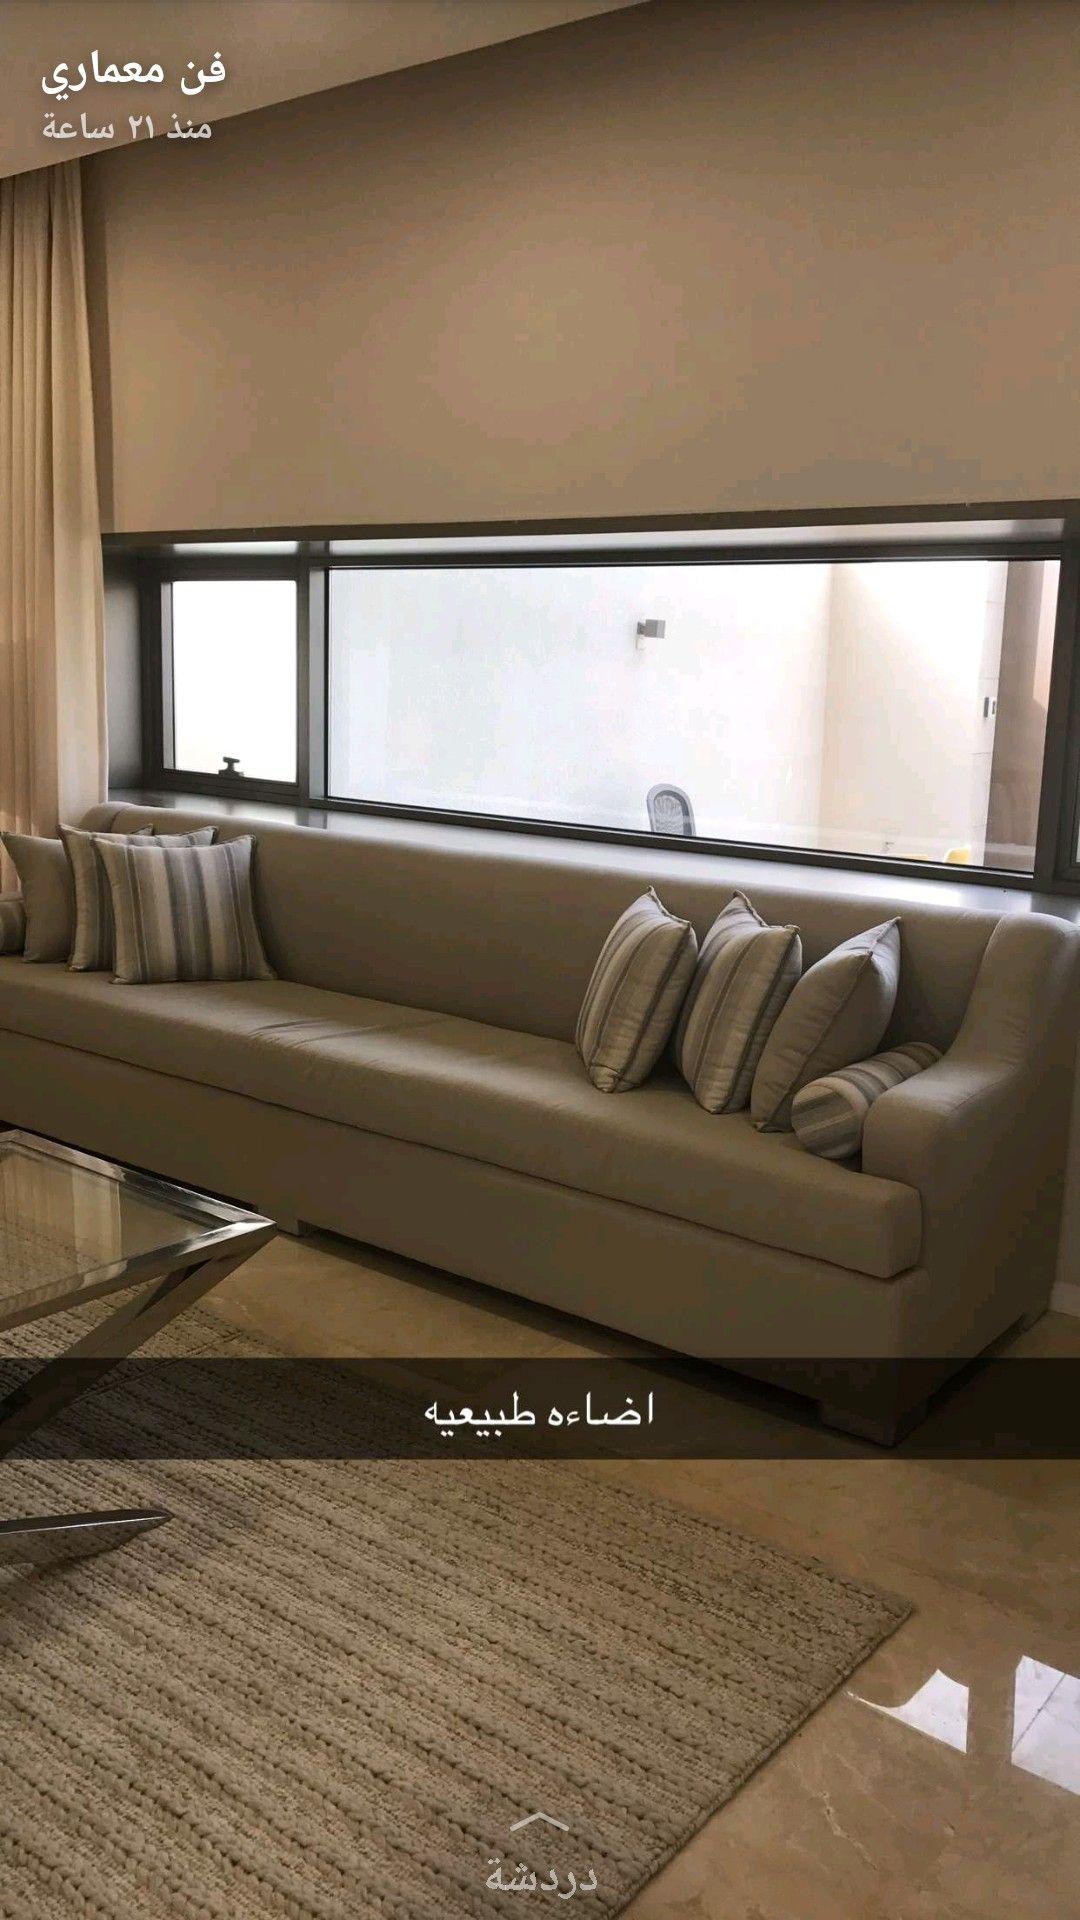 مجلس رجال Home Decor Furniture Home